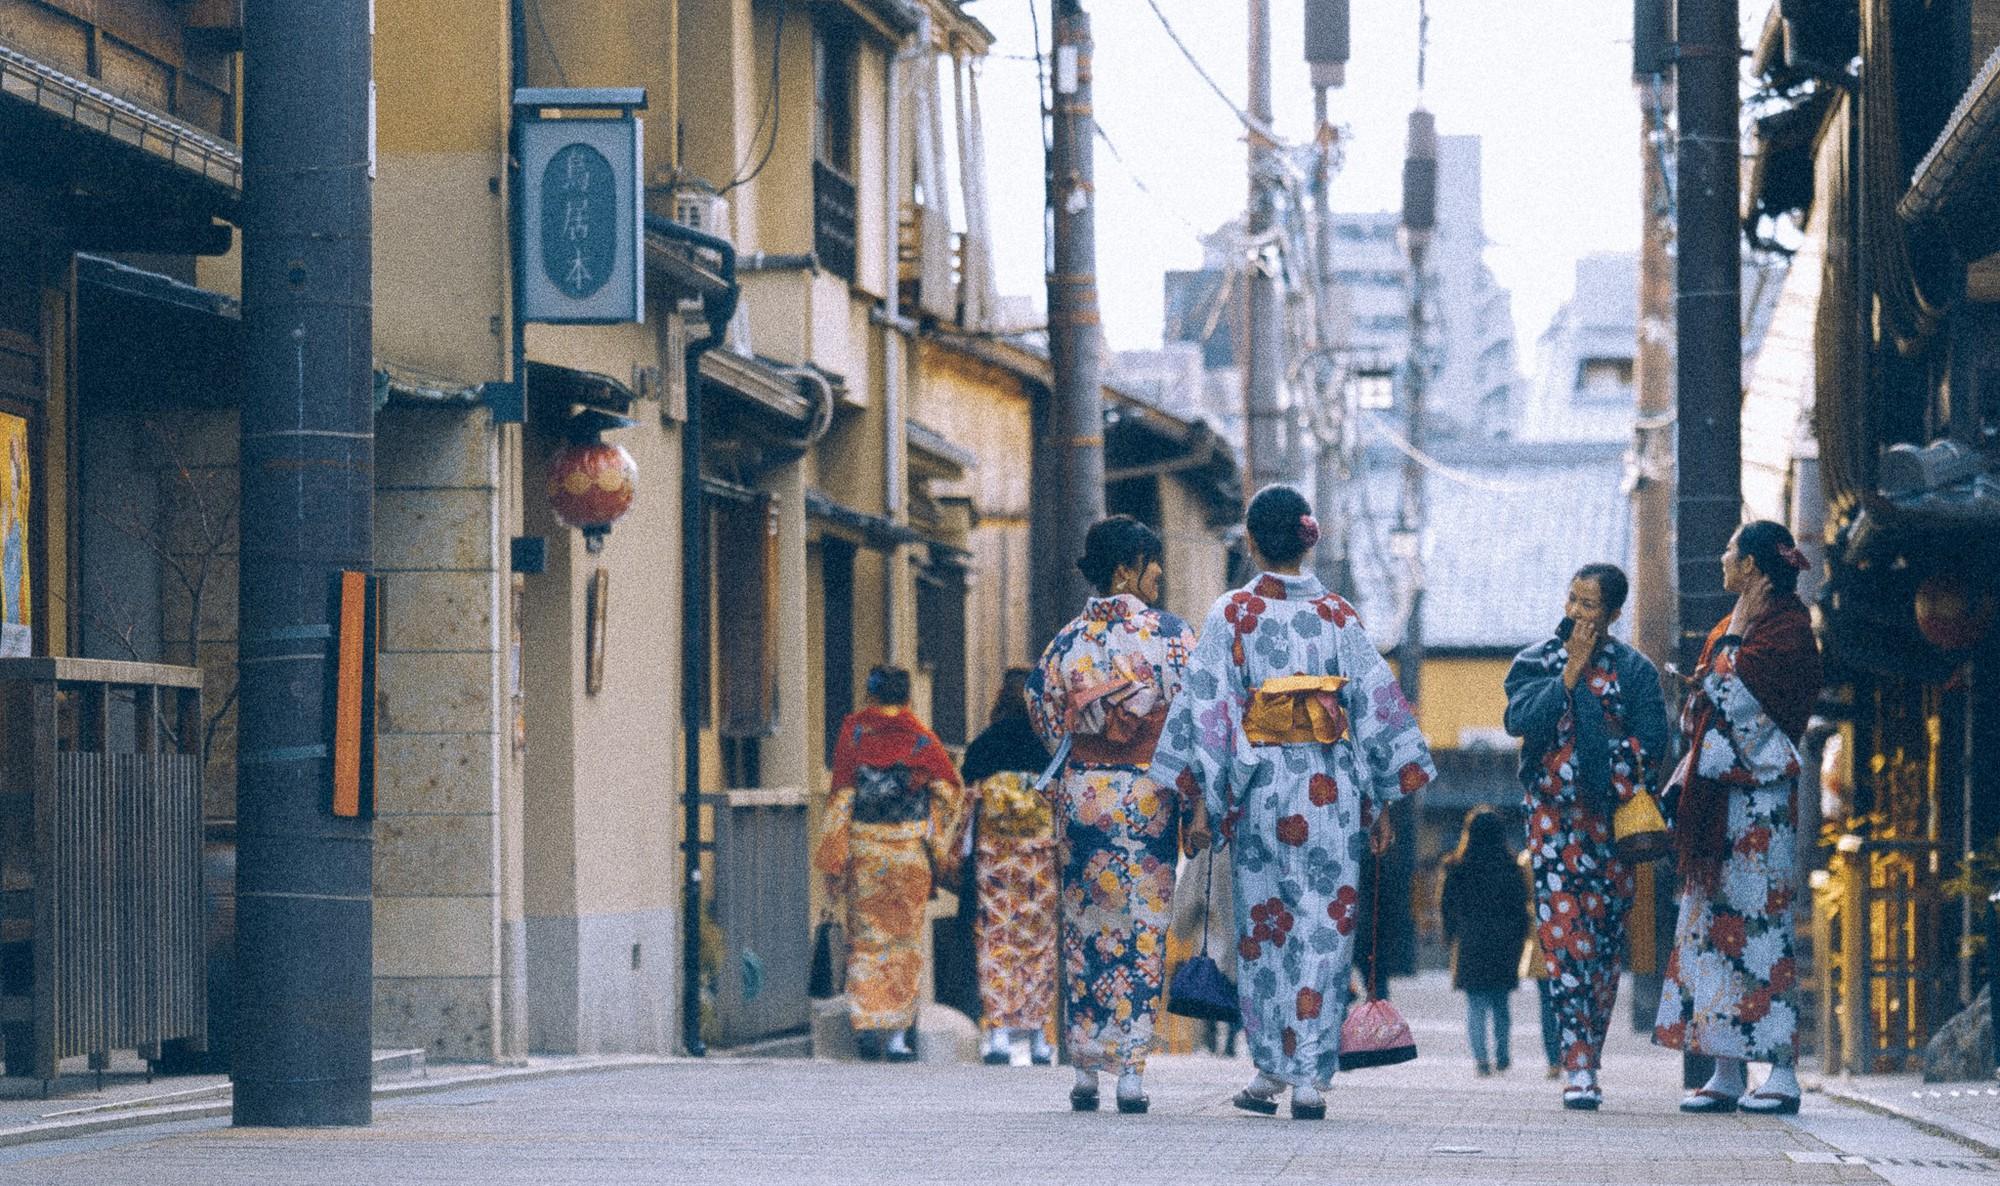 Ảnh phụ nữ Nhật bản trong trang phục Kimono